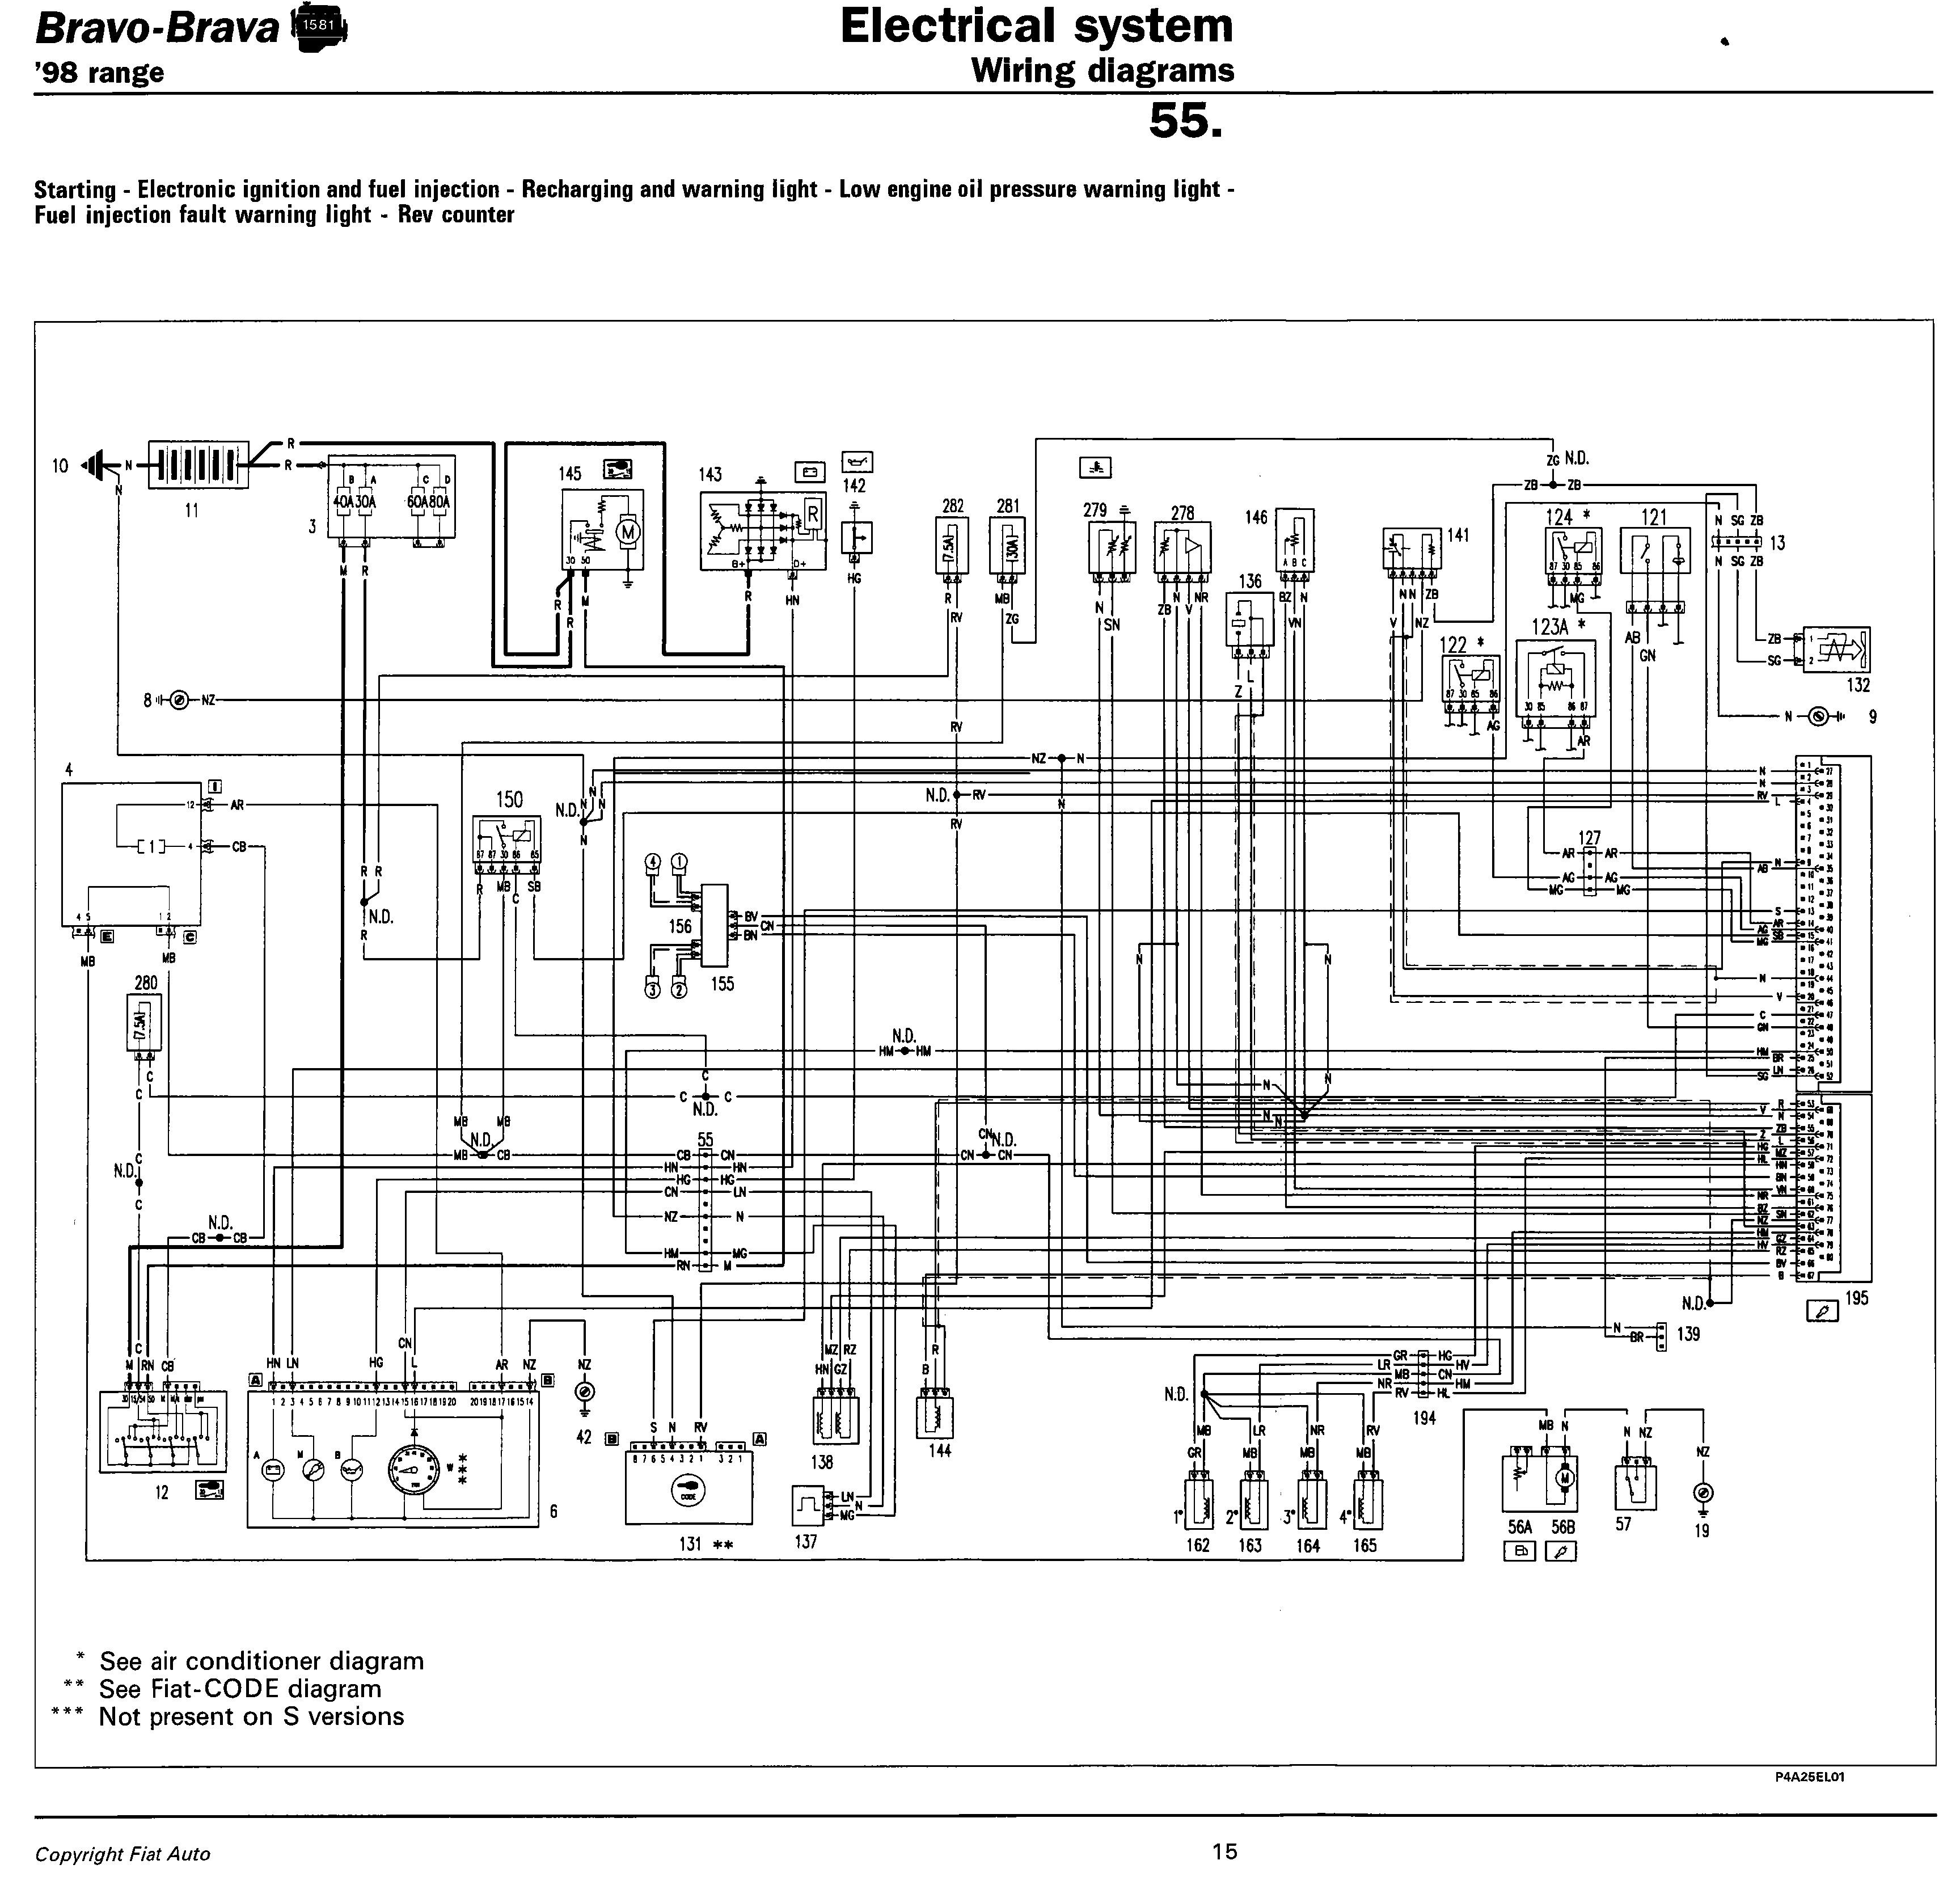 Technical  Brava 16 16v    wiring       diagram     The    FIAT    Forum